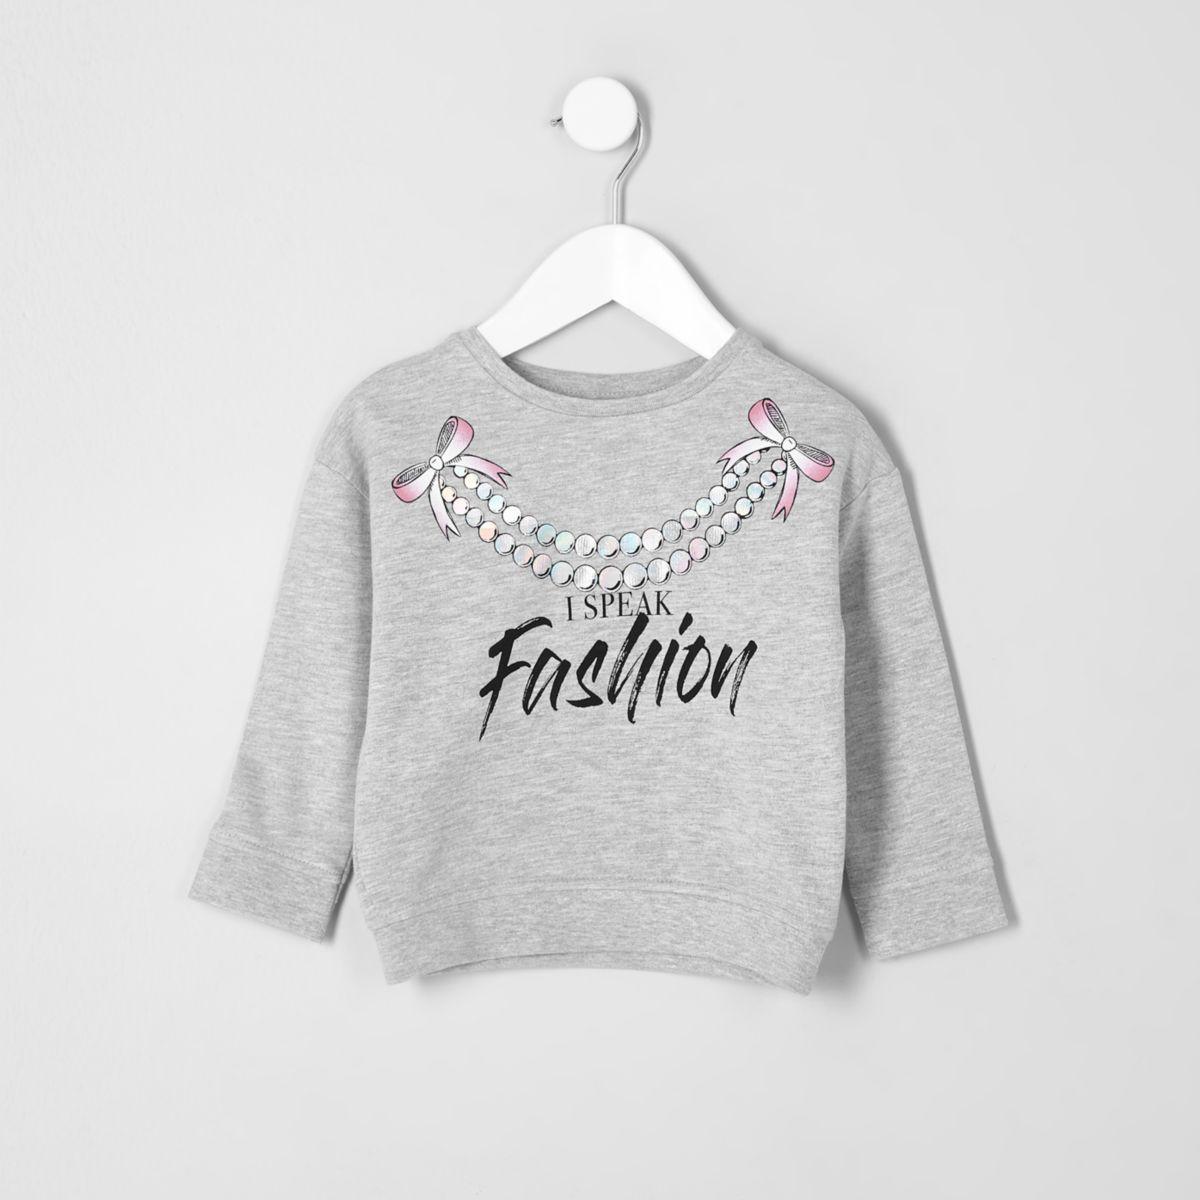 Mini girls grey marl 'fashion' sweatshirt